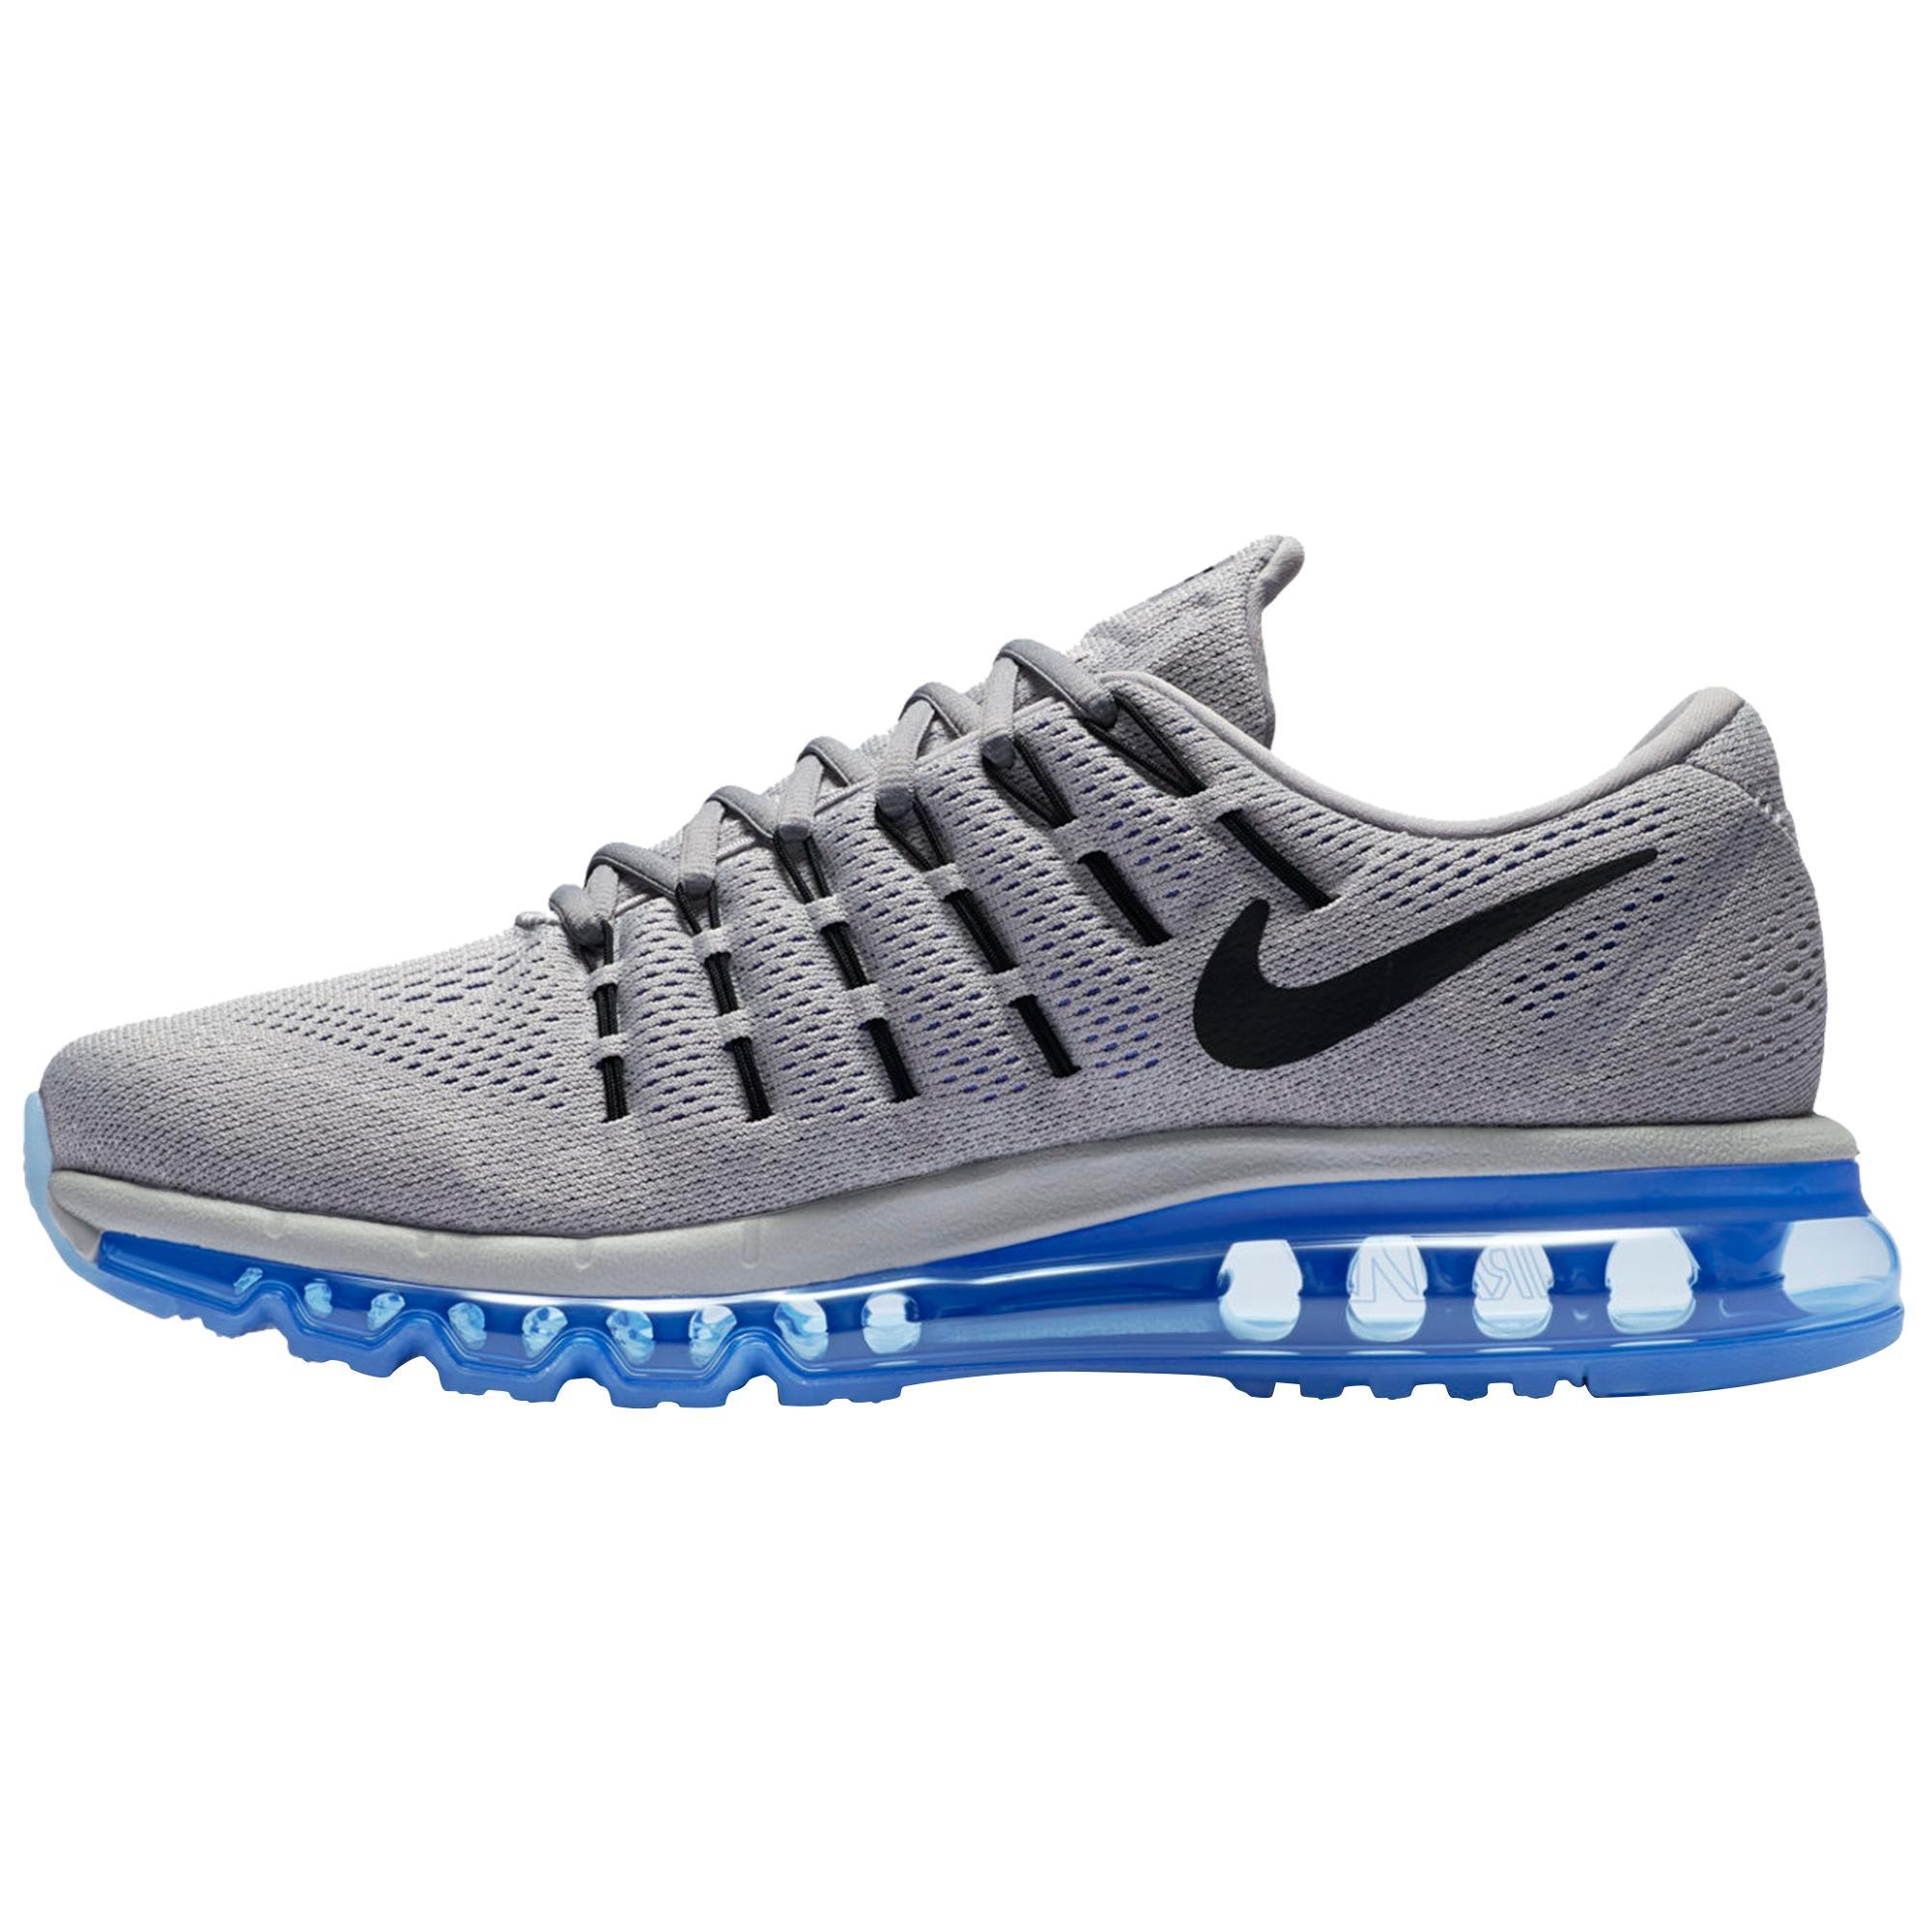 Nike Air Max 2016 New